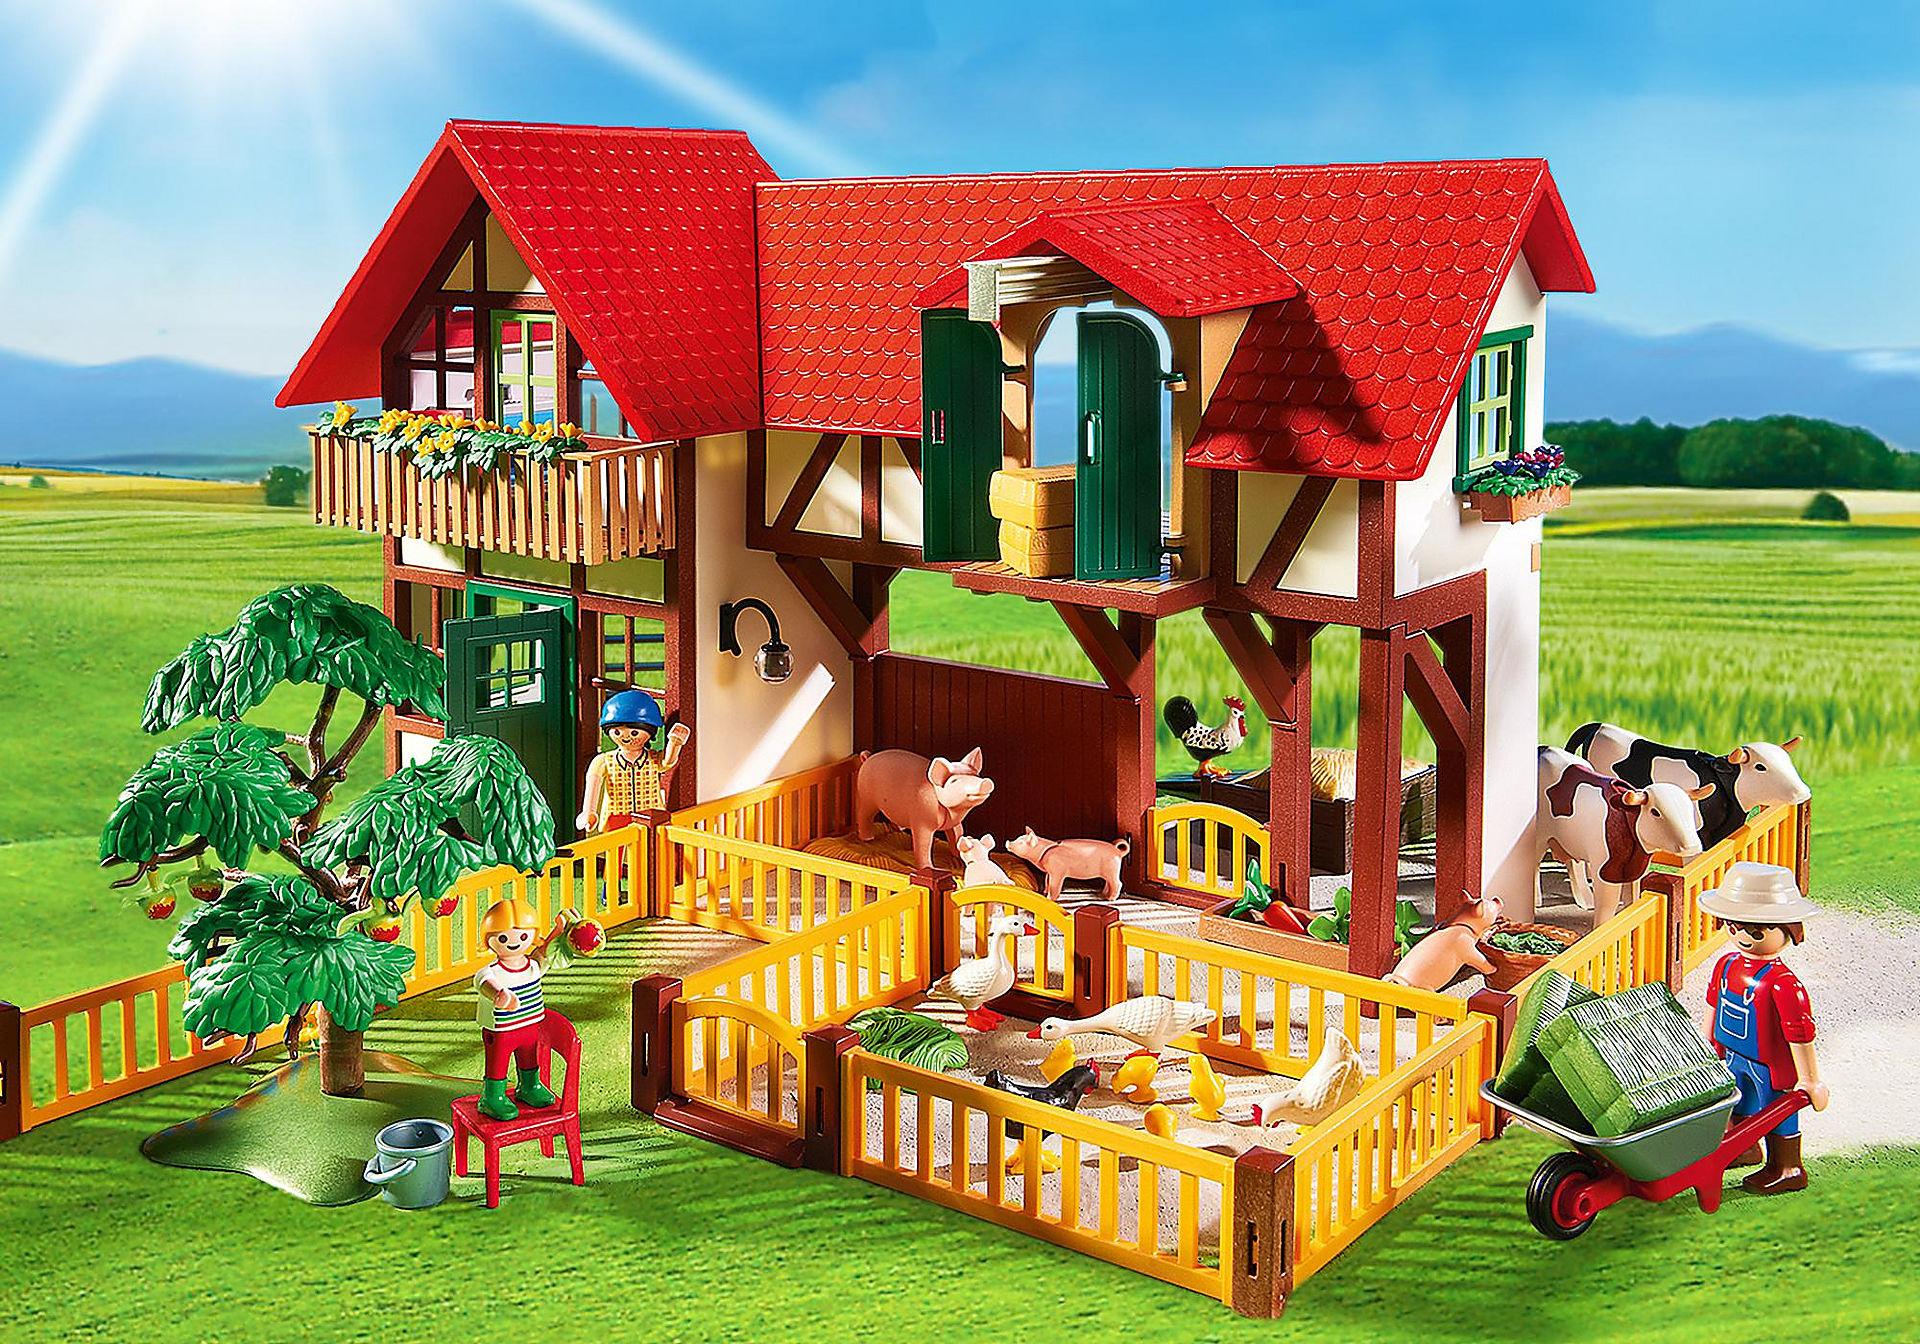 http://media.playmobil.com/i/playmobil/6120_product_extra4/Grote boerderij